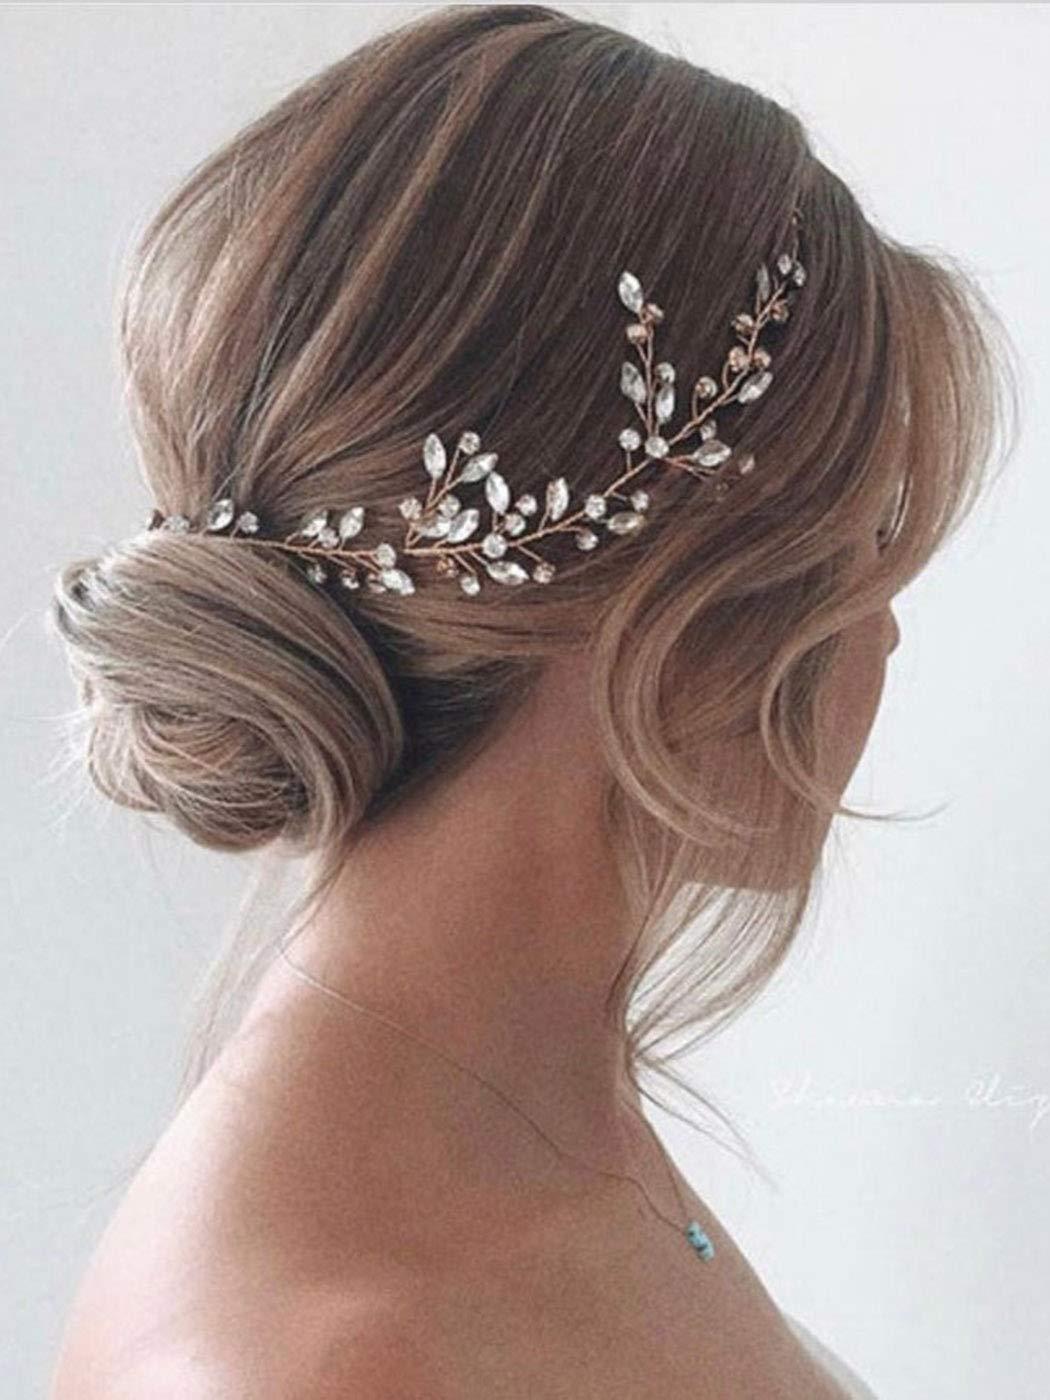 Amazon Com Jakawin Bride Crystal Wedding Hair Vine Silver Bridal Hair Piece Rhinestone Hair Accessories For Women And Girls Hv113 Beauty